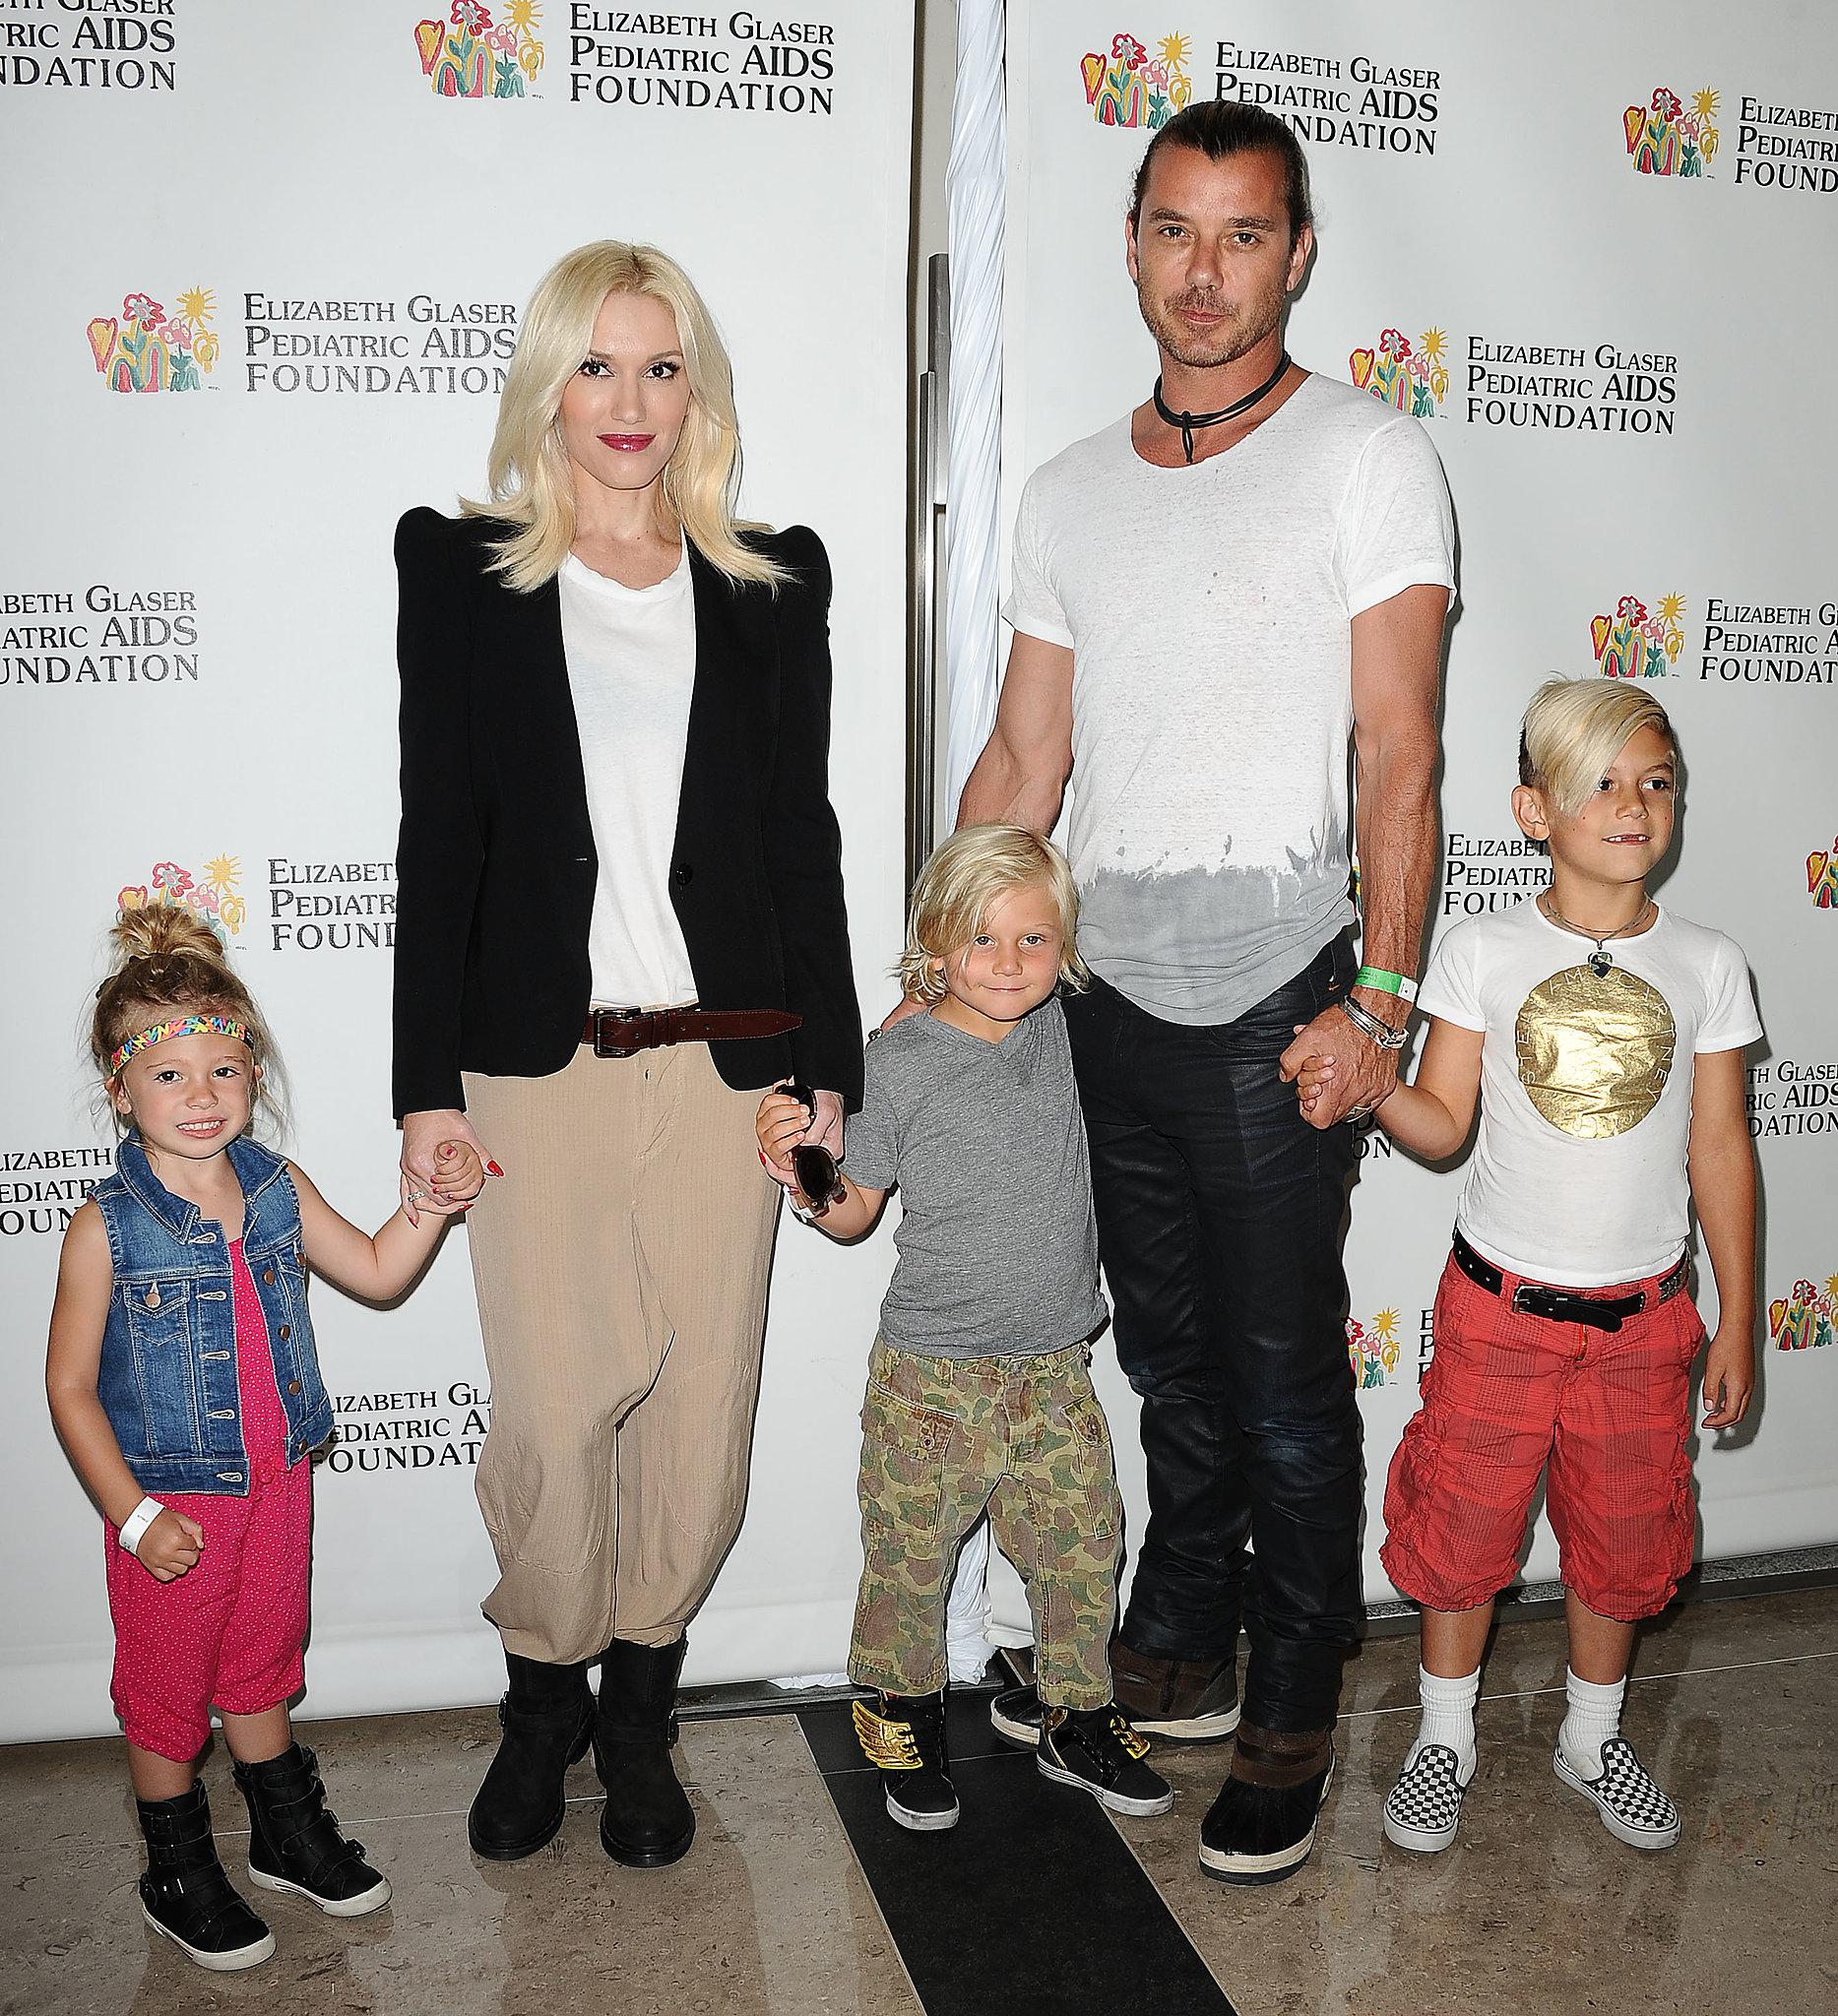 Gwen Stefani and Gavin Rossdale held the children's hands.